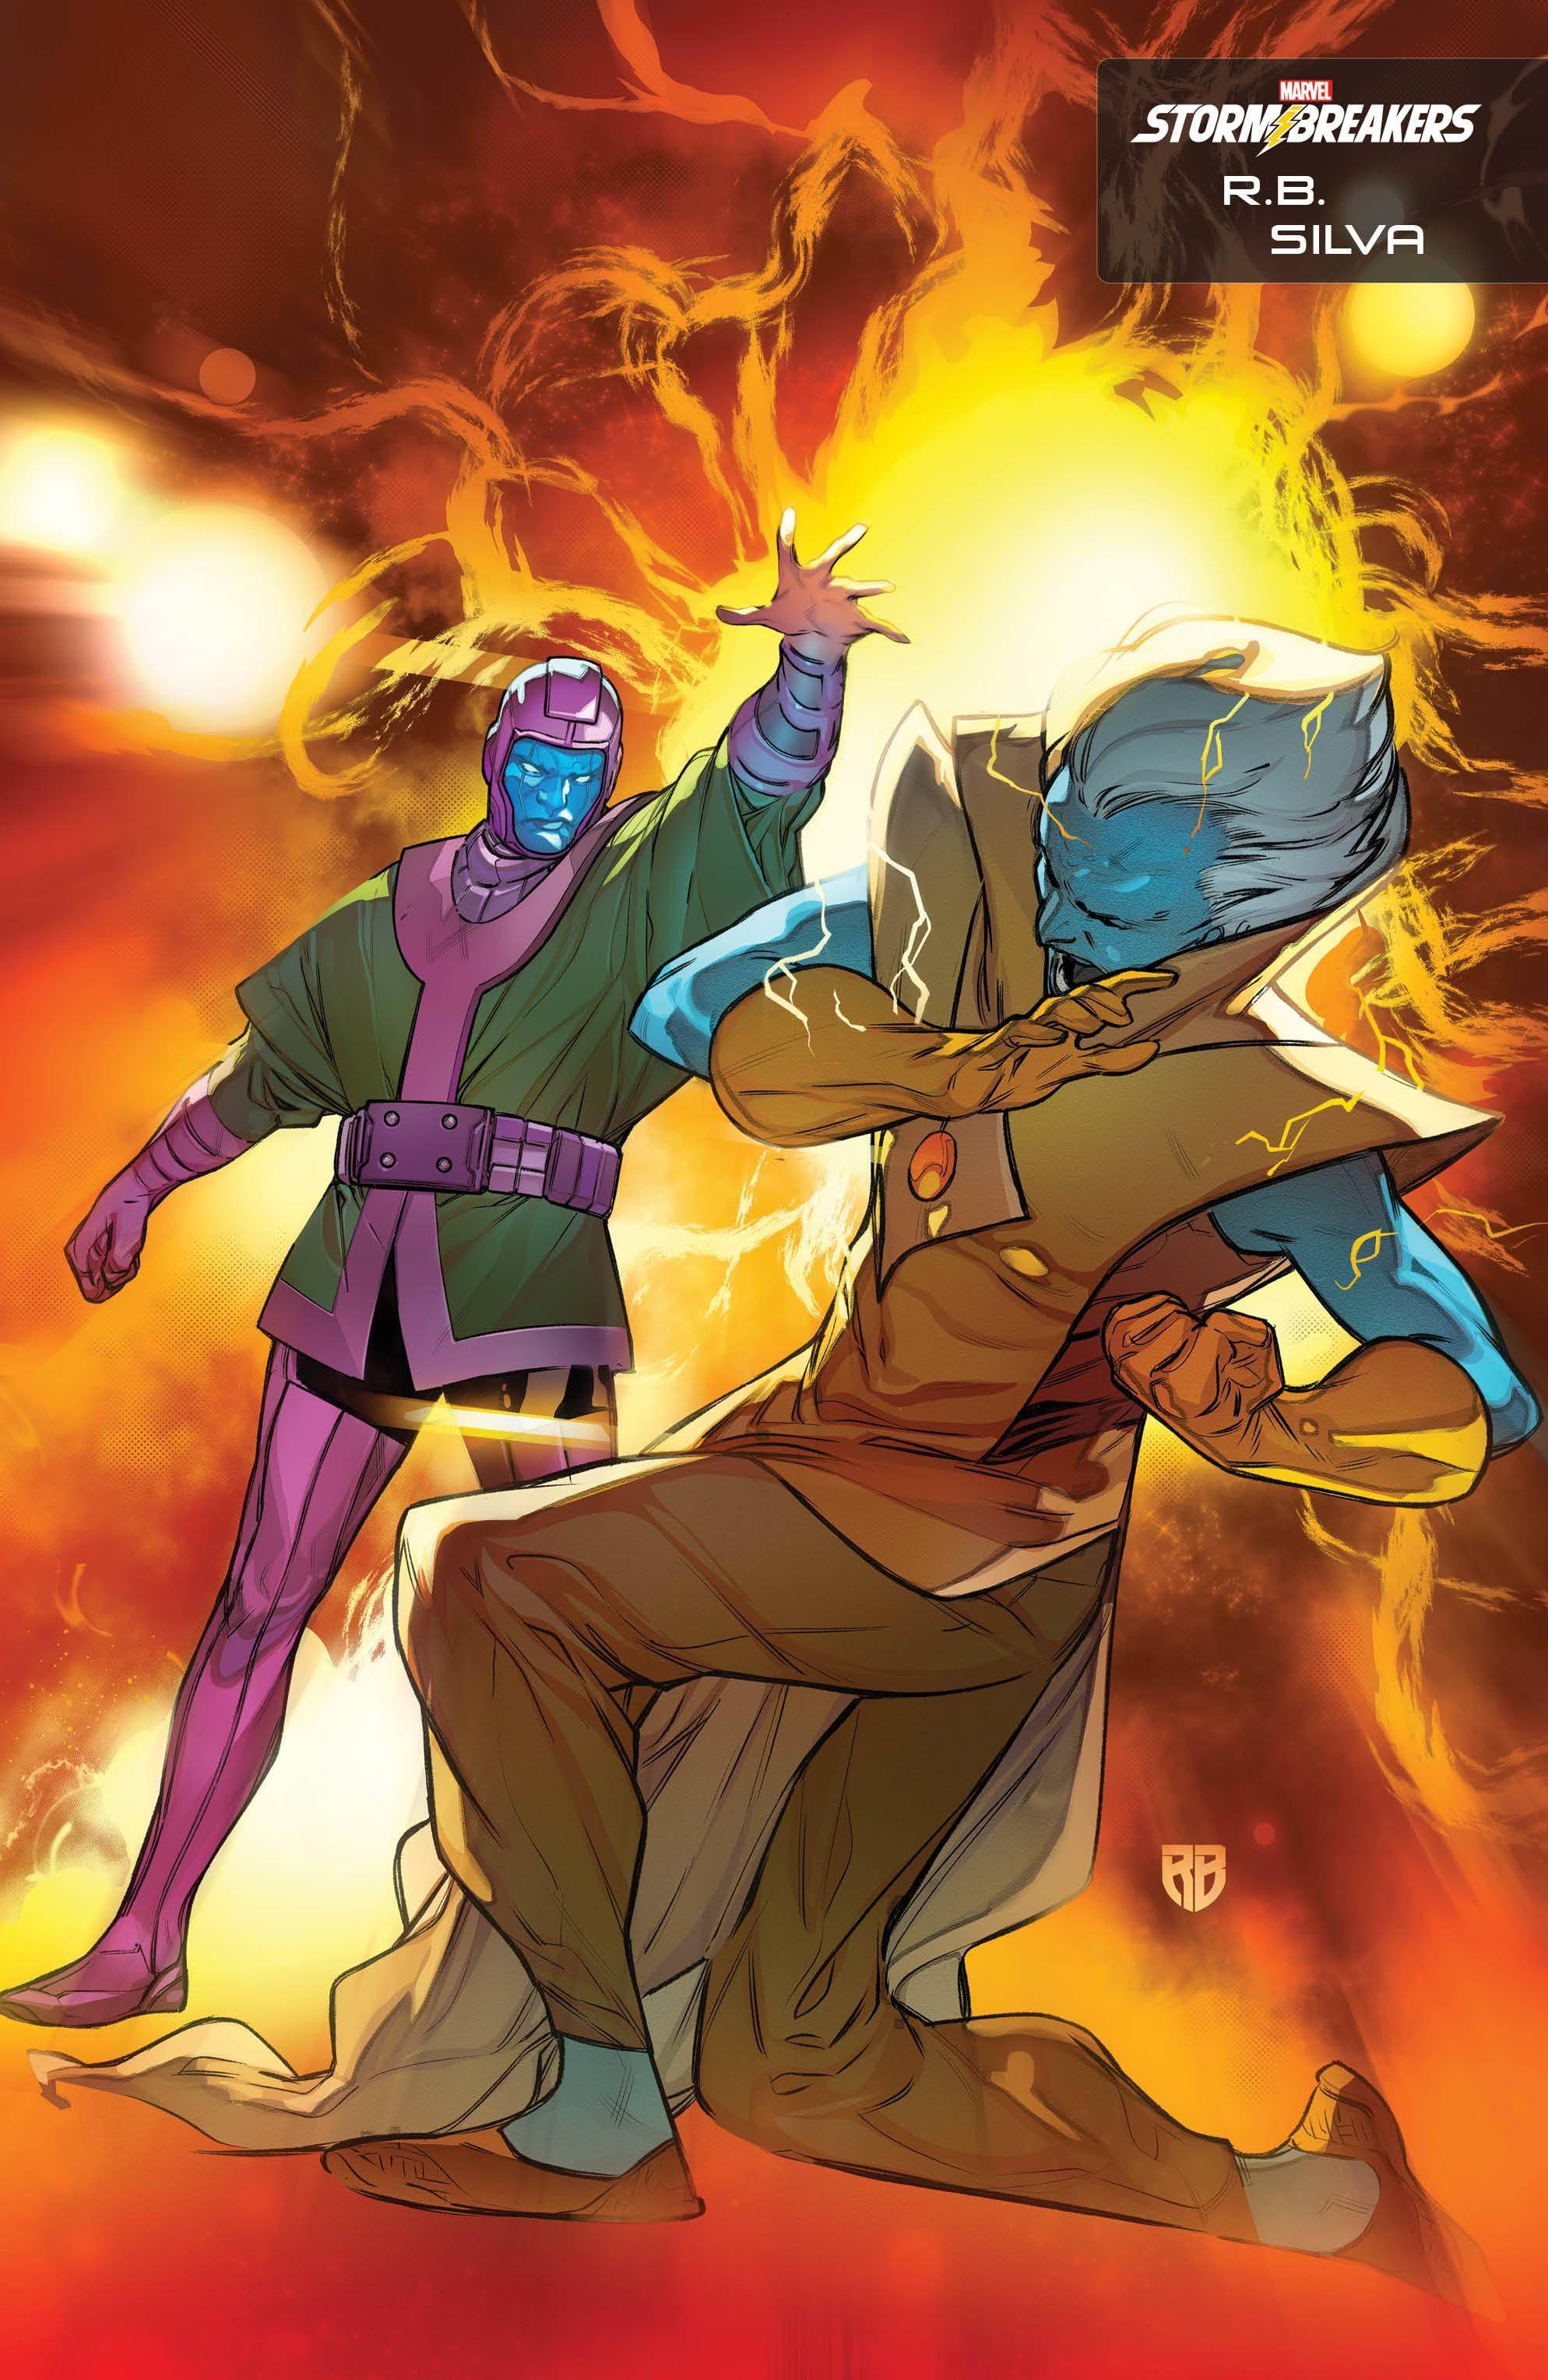 eyJidWNrZXQiOiJnb2NvbGxlY3QuaW1hZ2VzLnB1YiIsImtleSI6ImQwYjk1NzJiLWVkZjEtNDAyMS1iY2E0LWM0NjlmN2FlODAwZS5qcGciLCJlZGl0cyI6W119 ComicList: Marvel Comics New Releases for 08/18/2021